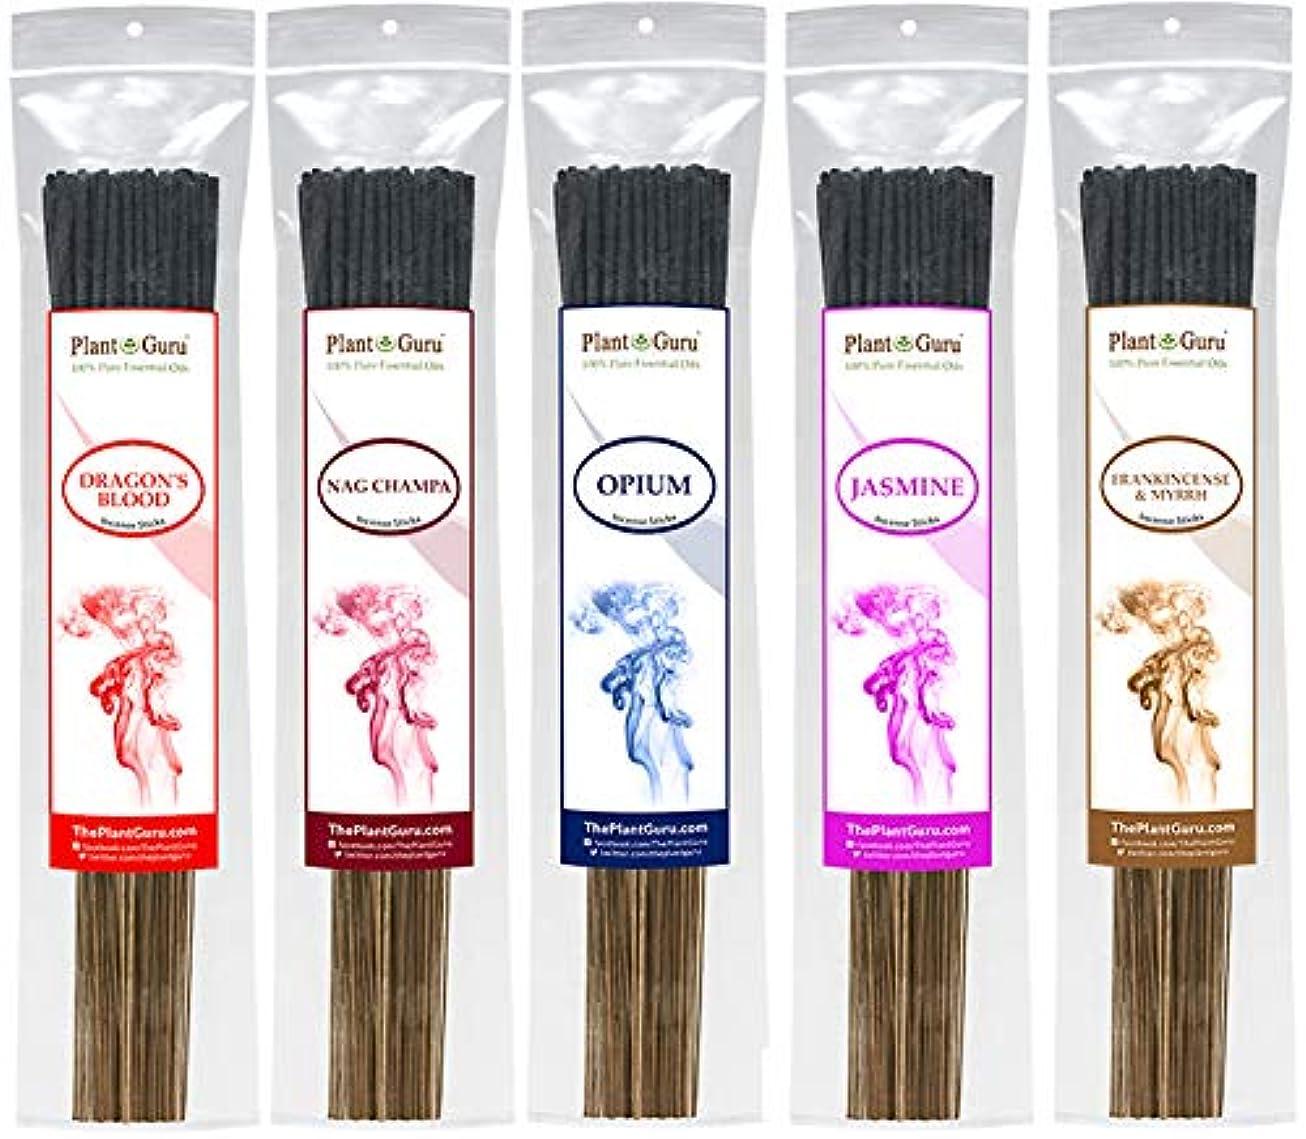 IncenseサンプラーセットエキゾチックIncense Sticks 925グラムスティック数合計425 to 500 Sticksプレミアム品質Smooth Clean Burn各スティックは10.5インチ長Burn...